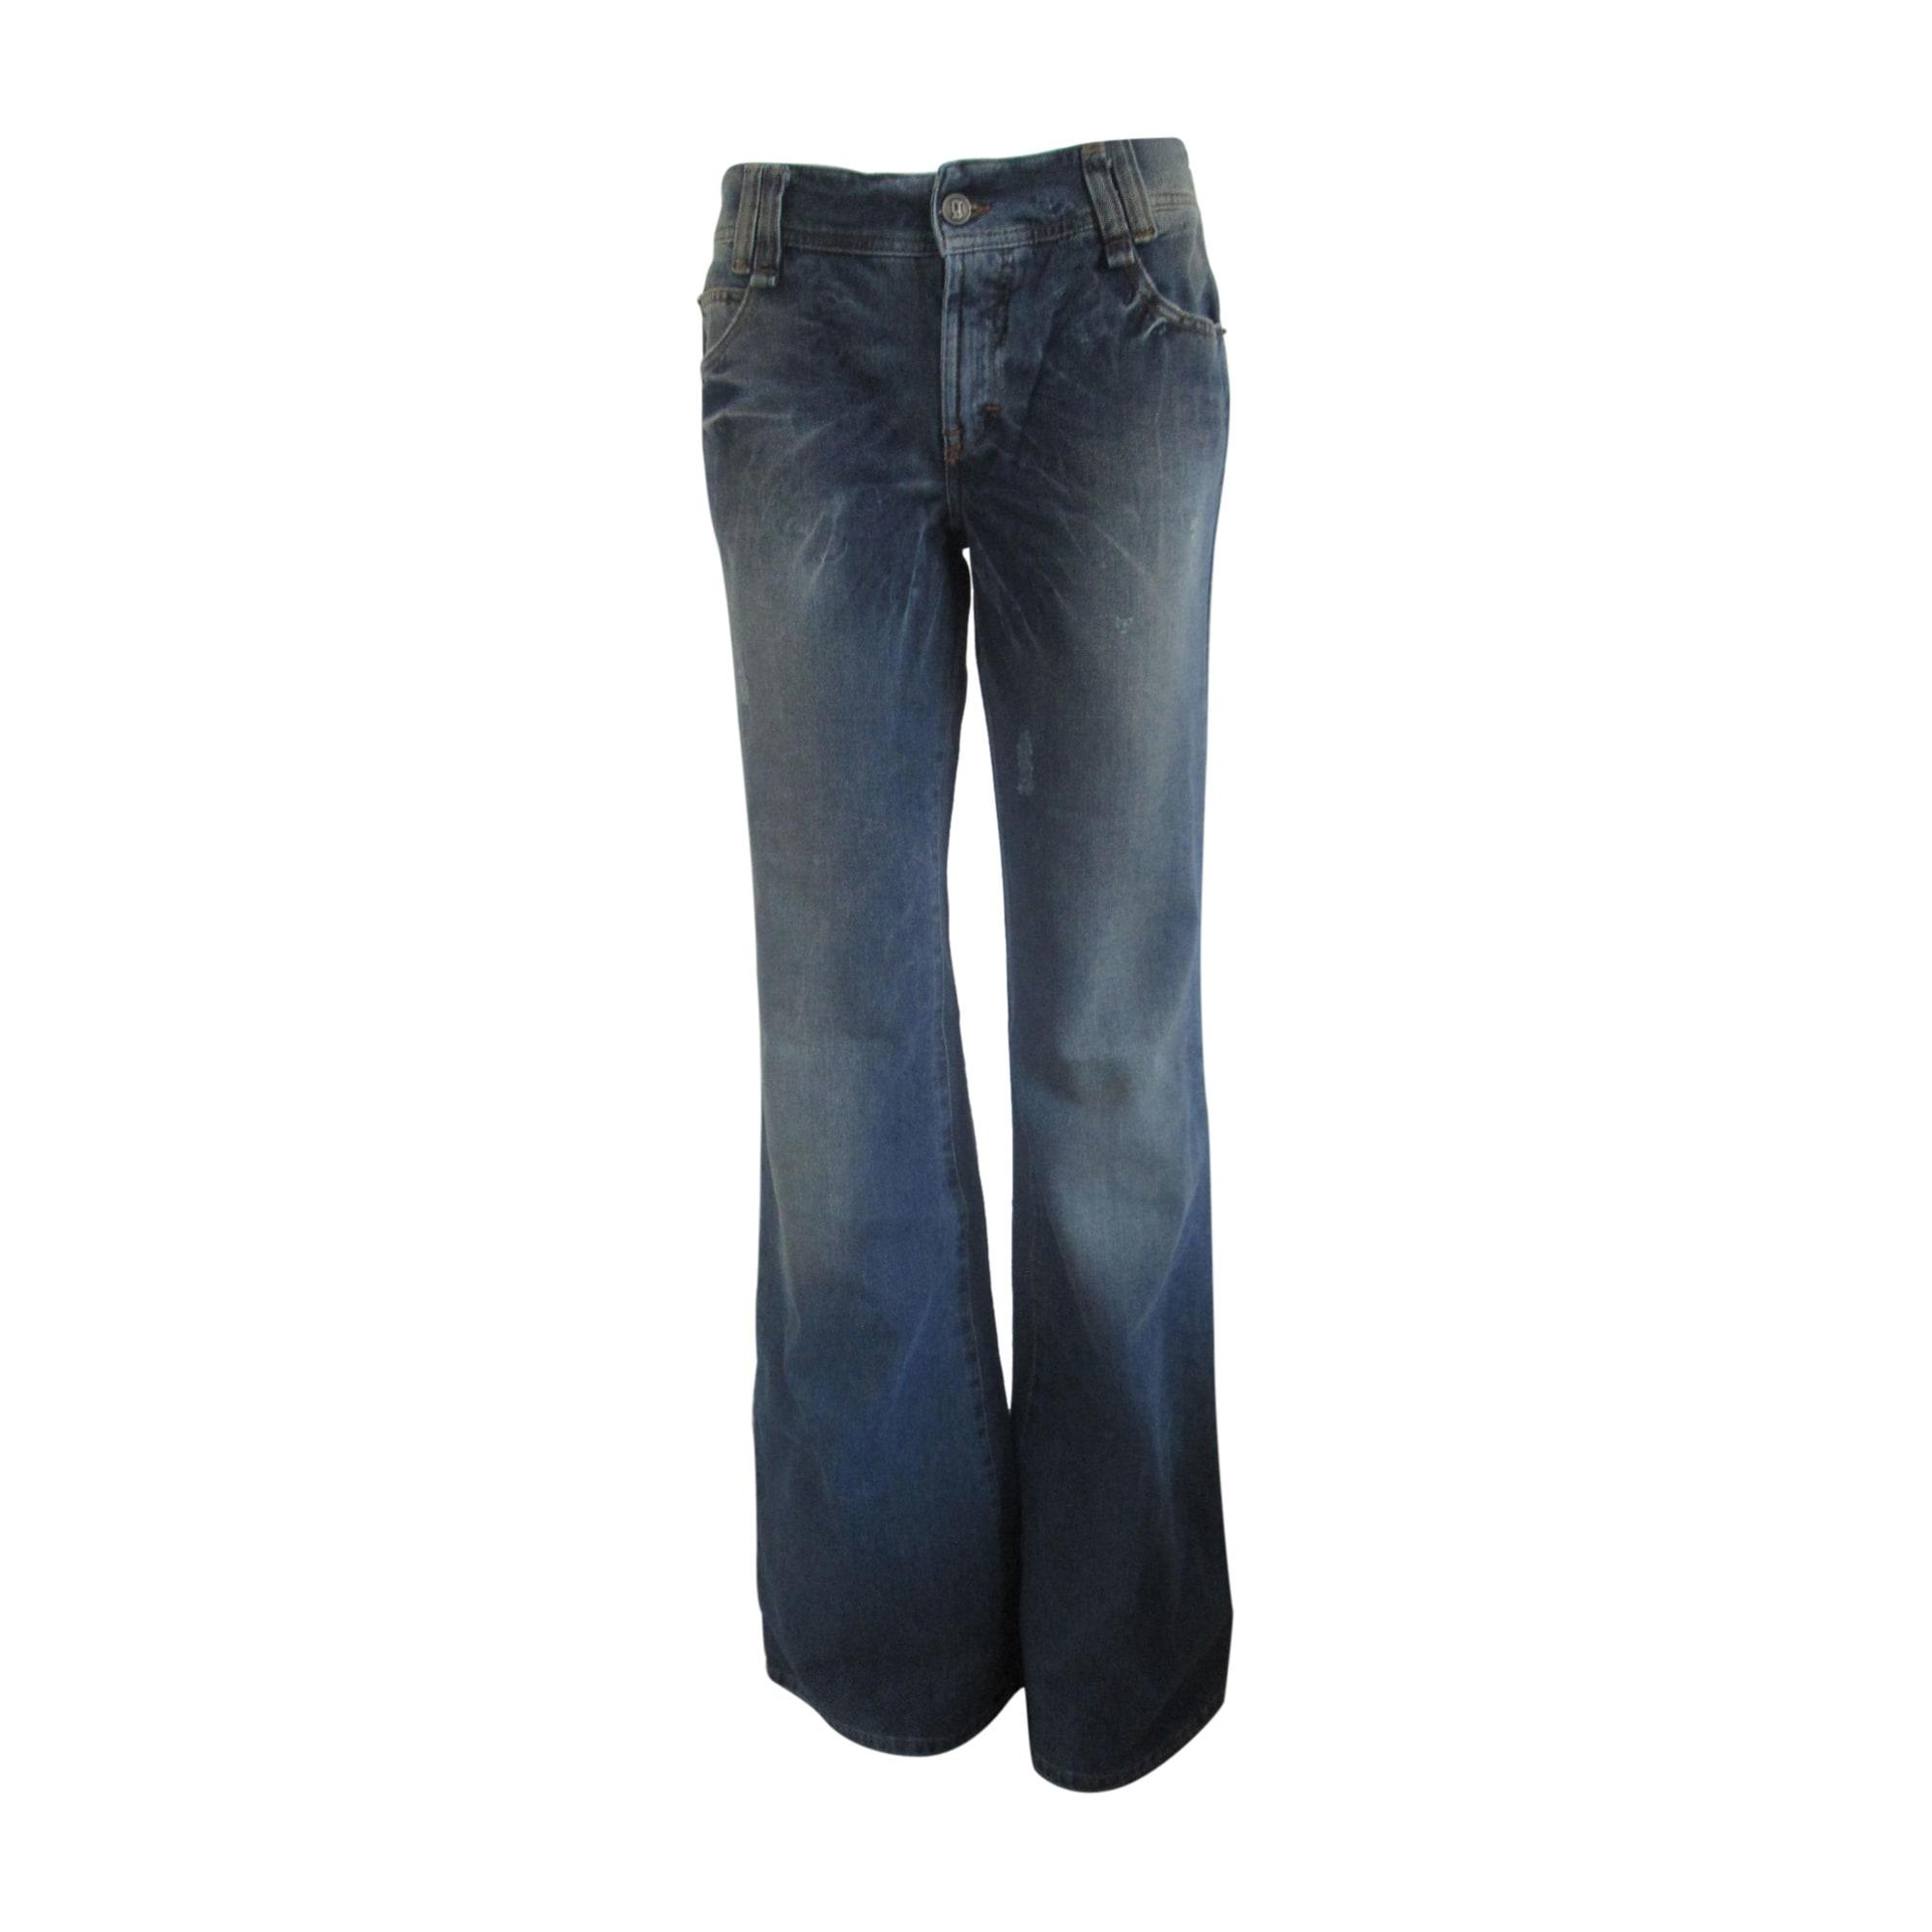 Jeans large, boyfriend JOHN GALLIANO Bleu, bleu marine, bleu turquoise